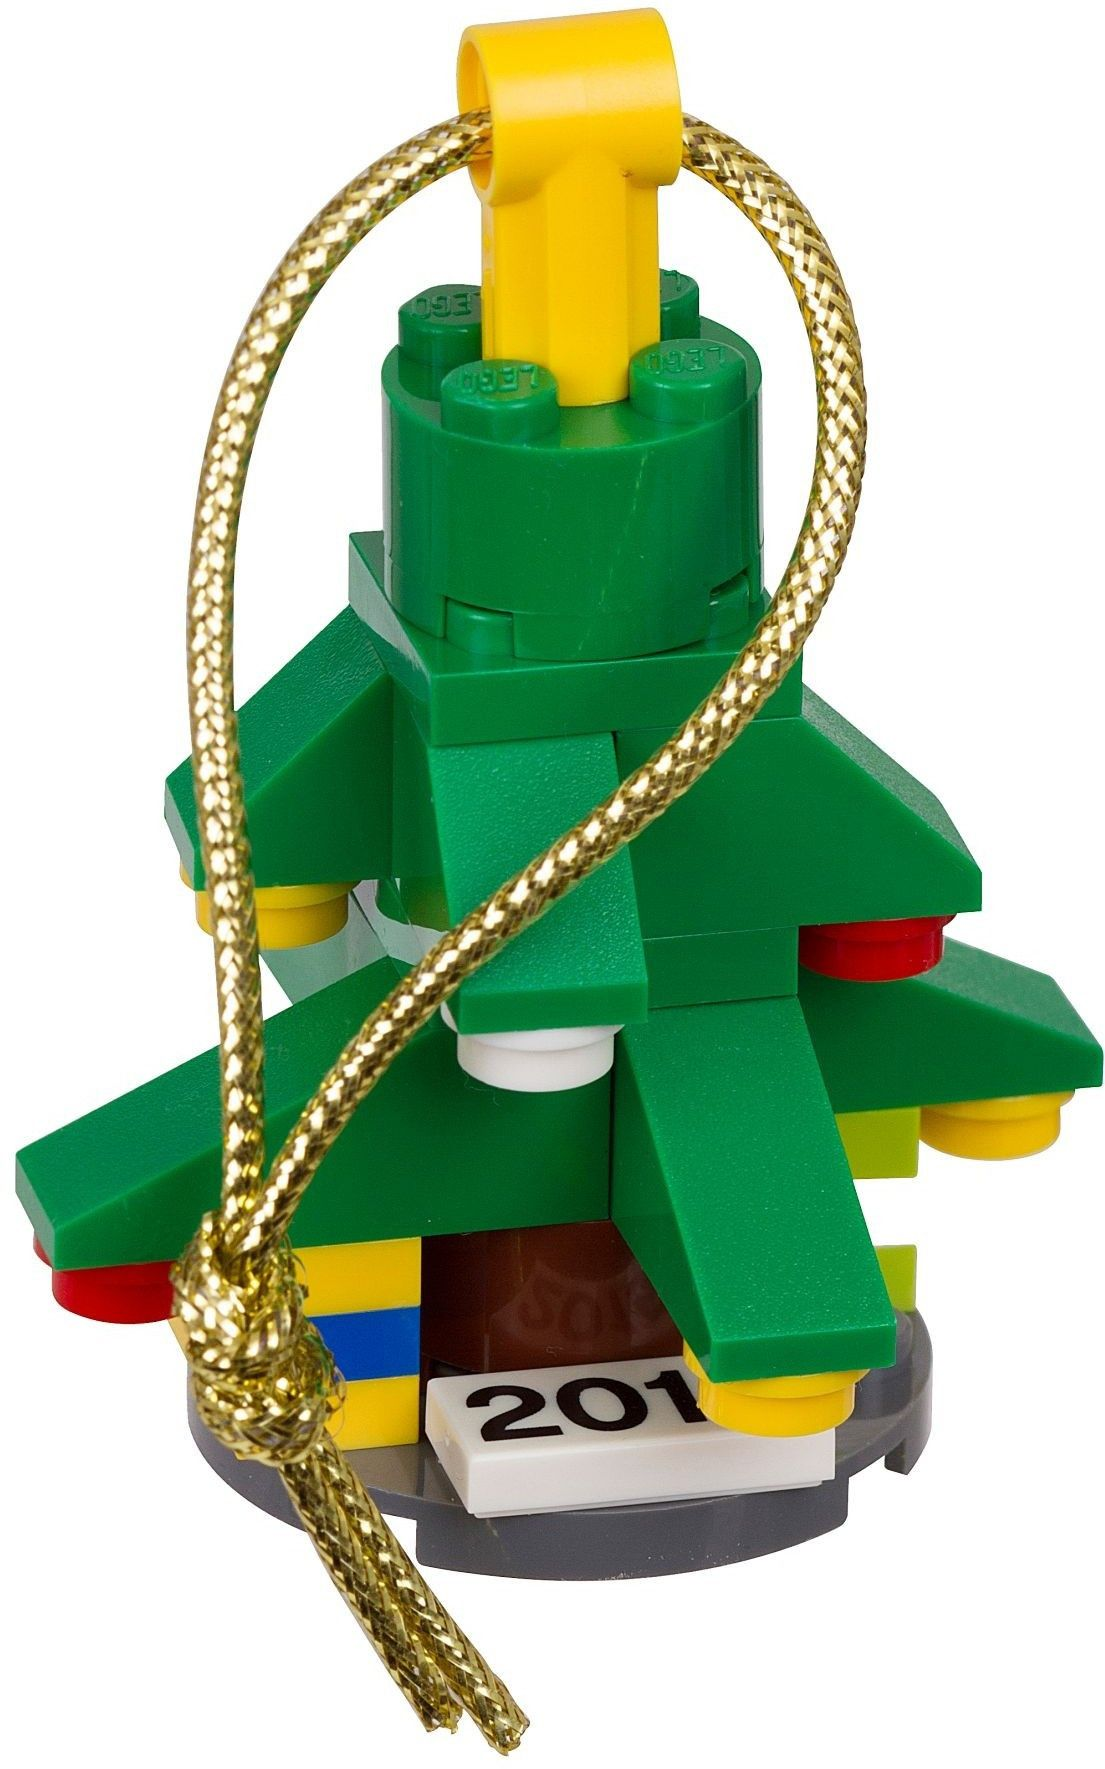 Lego christmas tree ornament lego pinterest lego